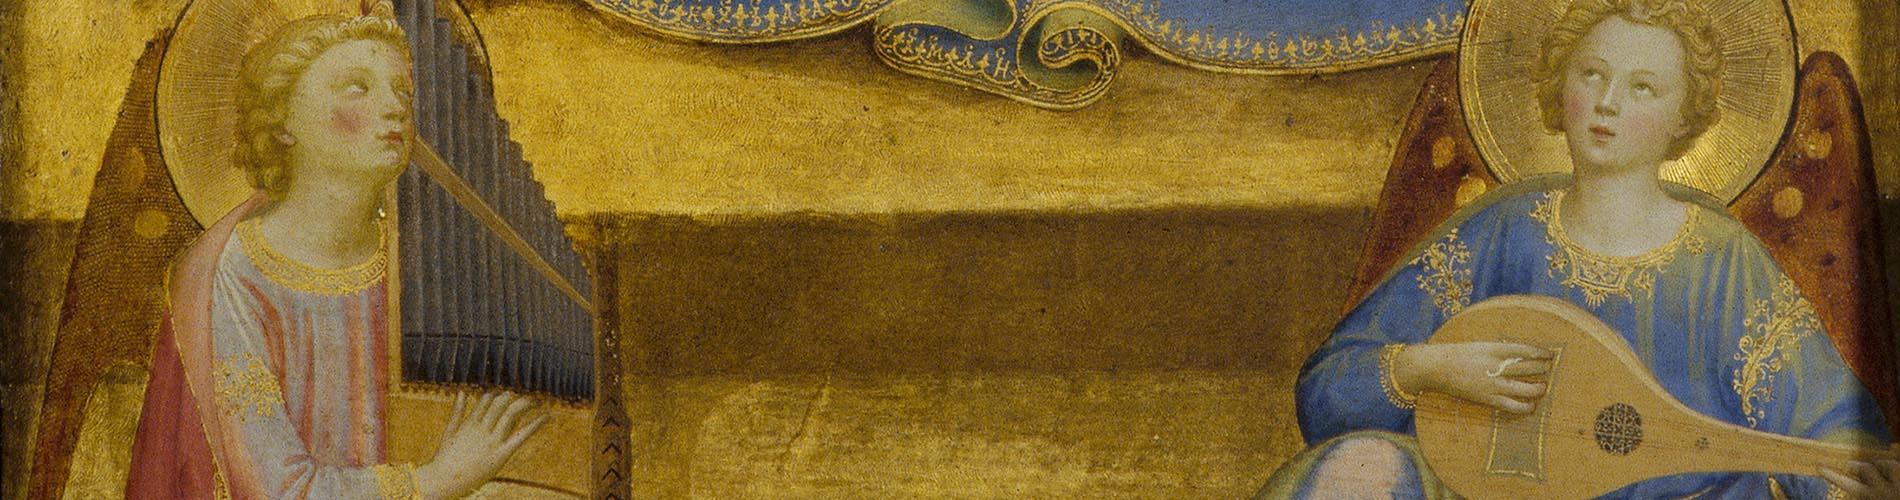 Fra Angelico, Mare de Déu de la Humilitat, 1433-1435